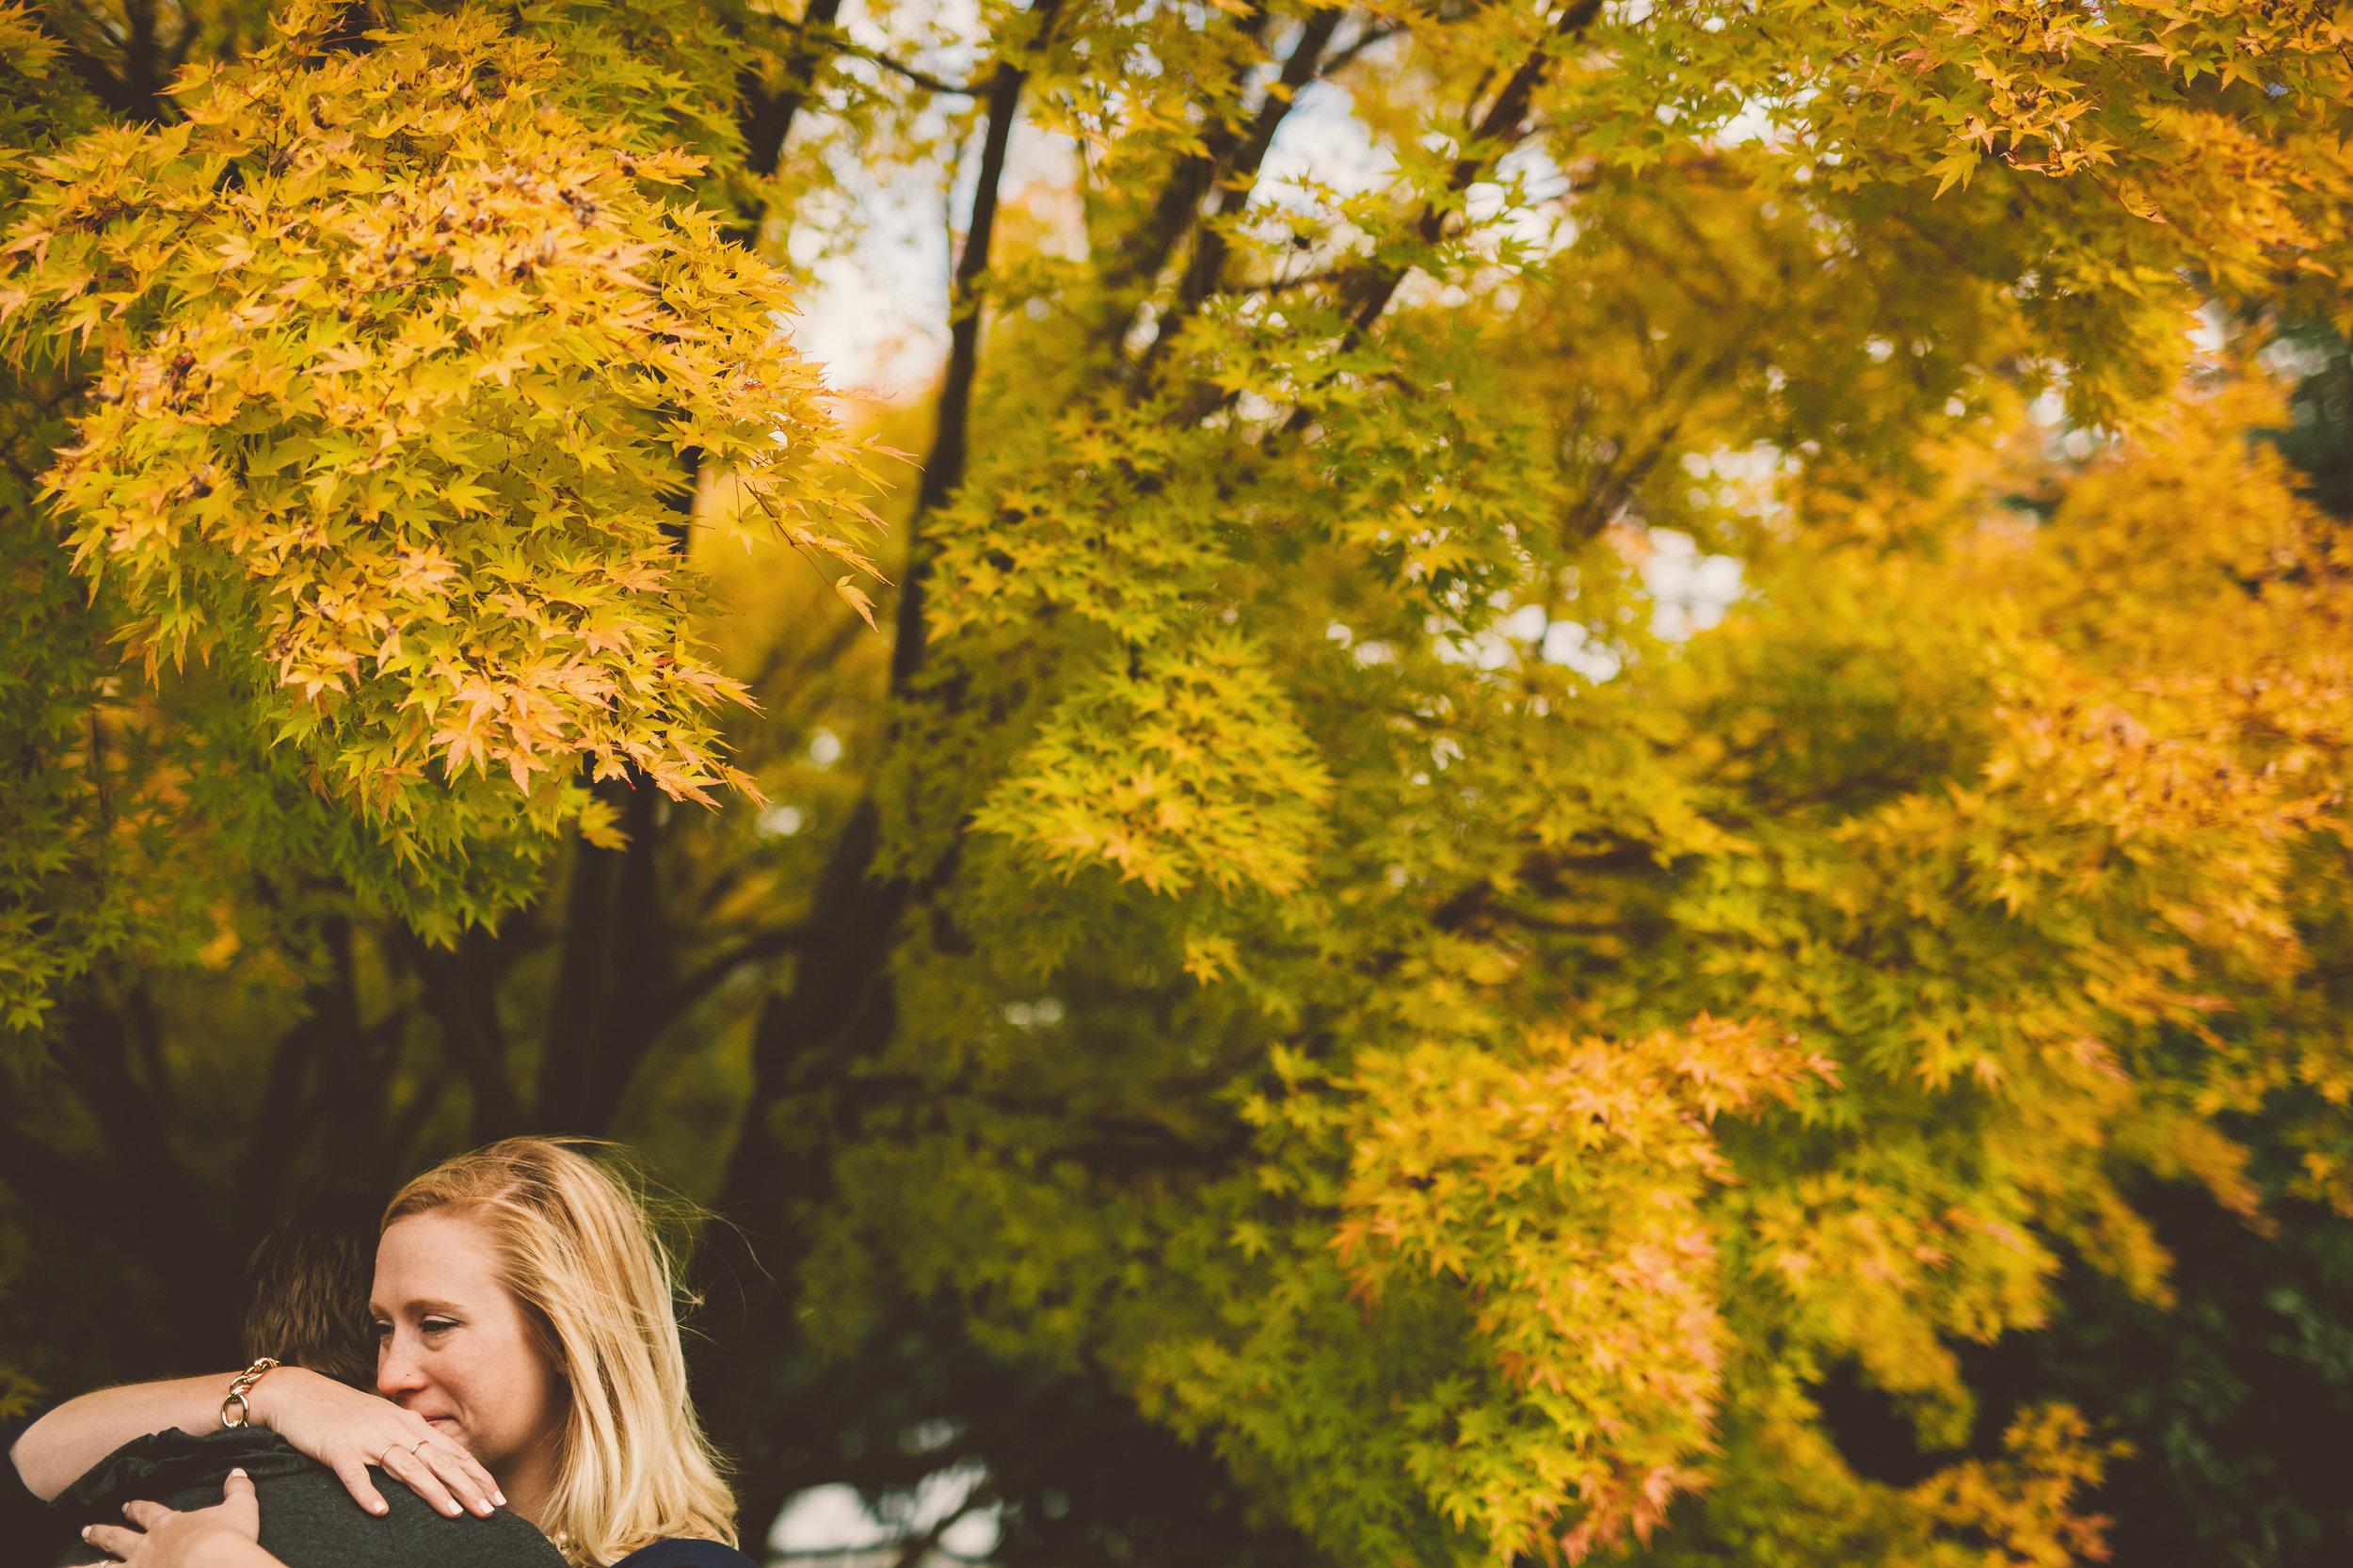 SarahandMatt-20151018-130001-FINALBW.jpg